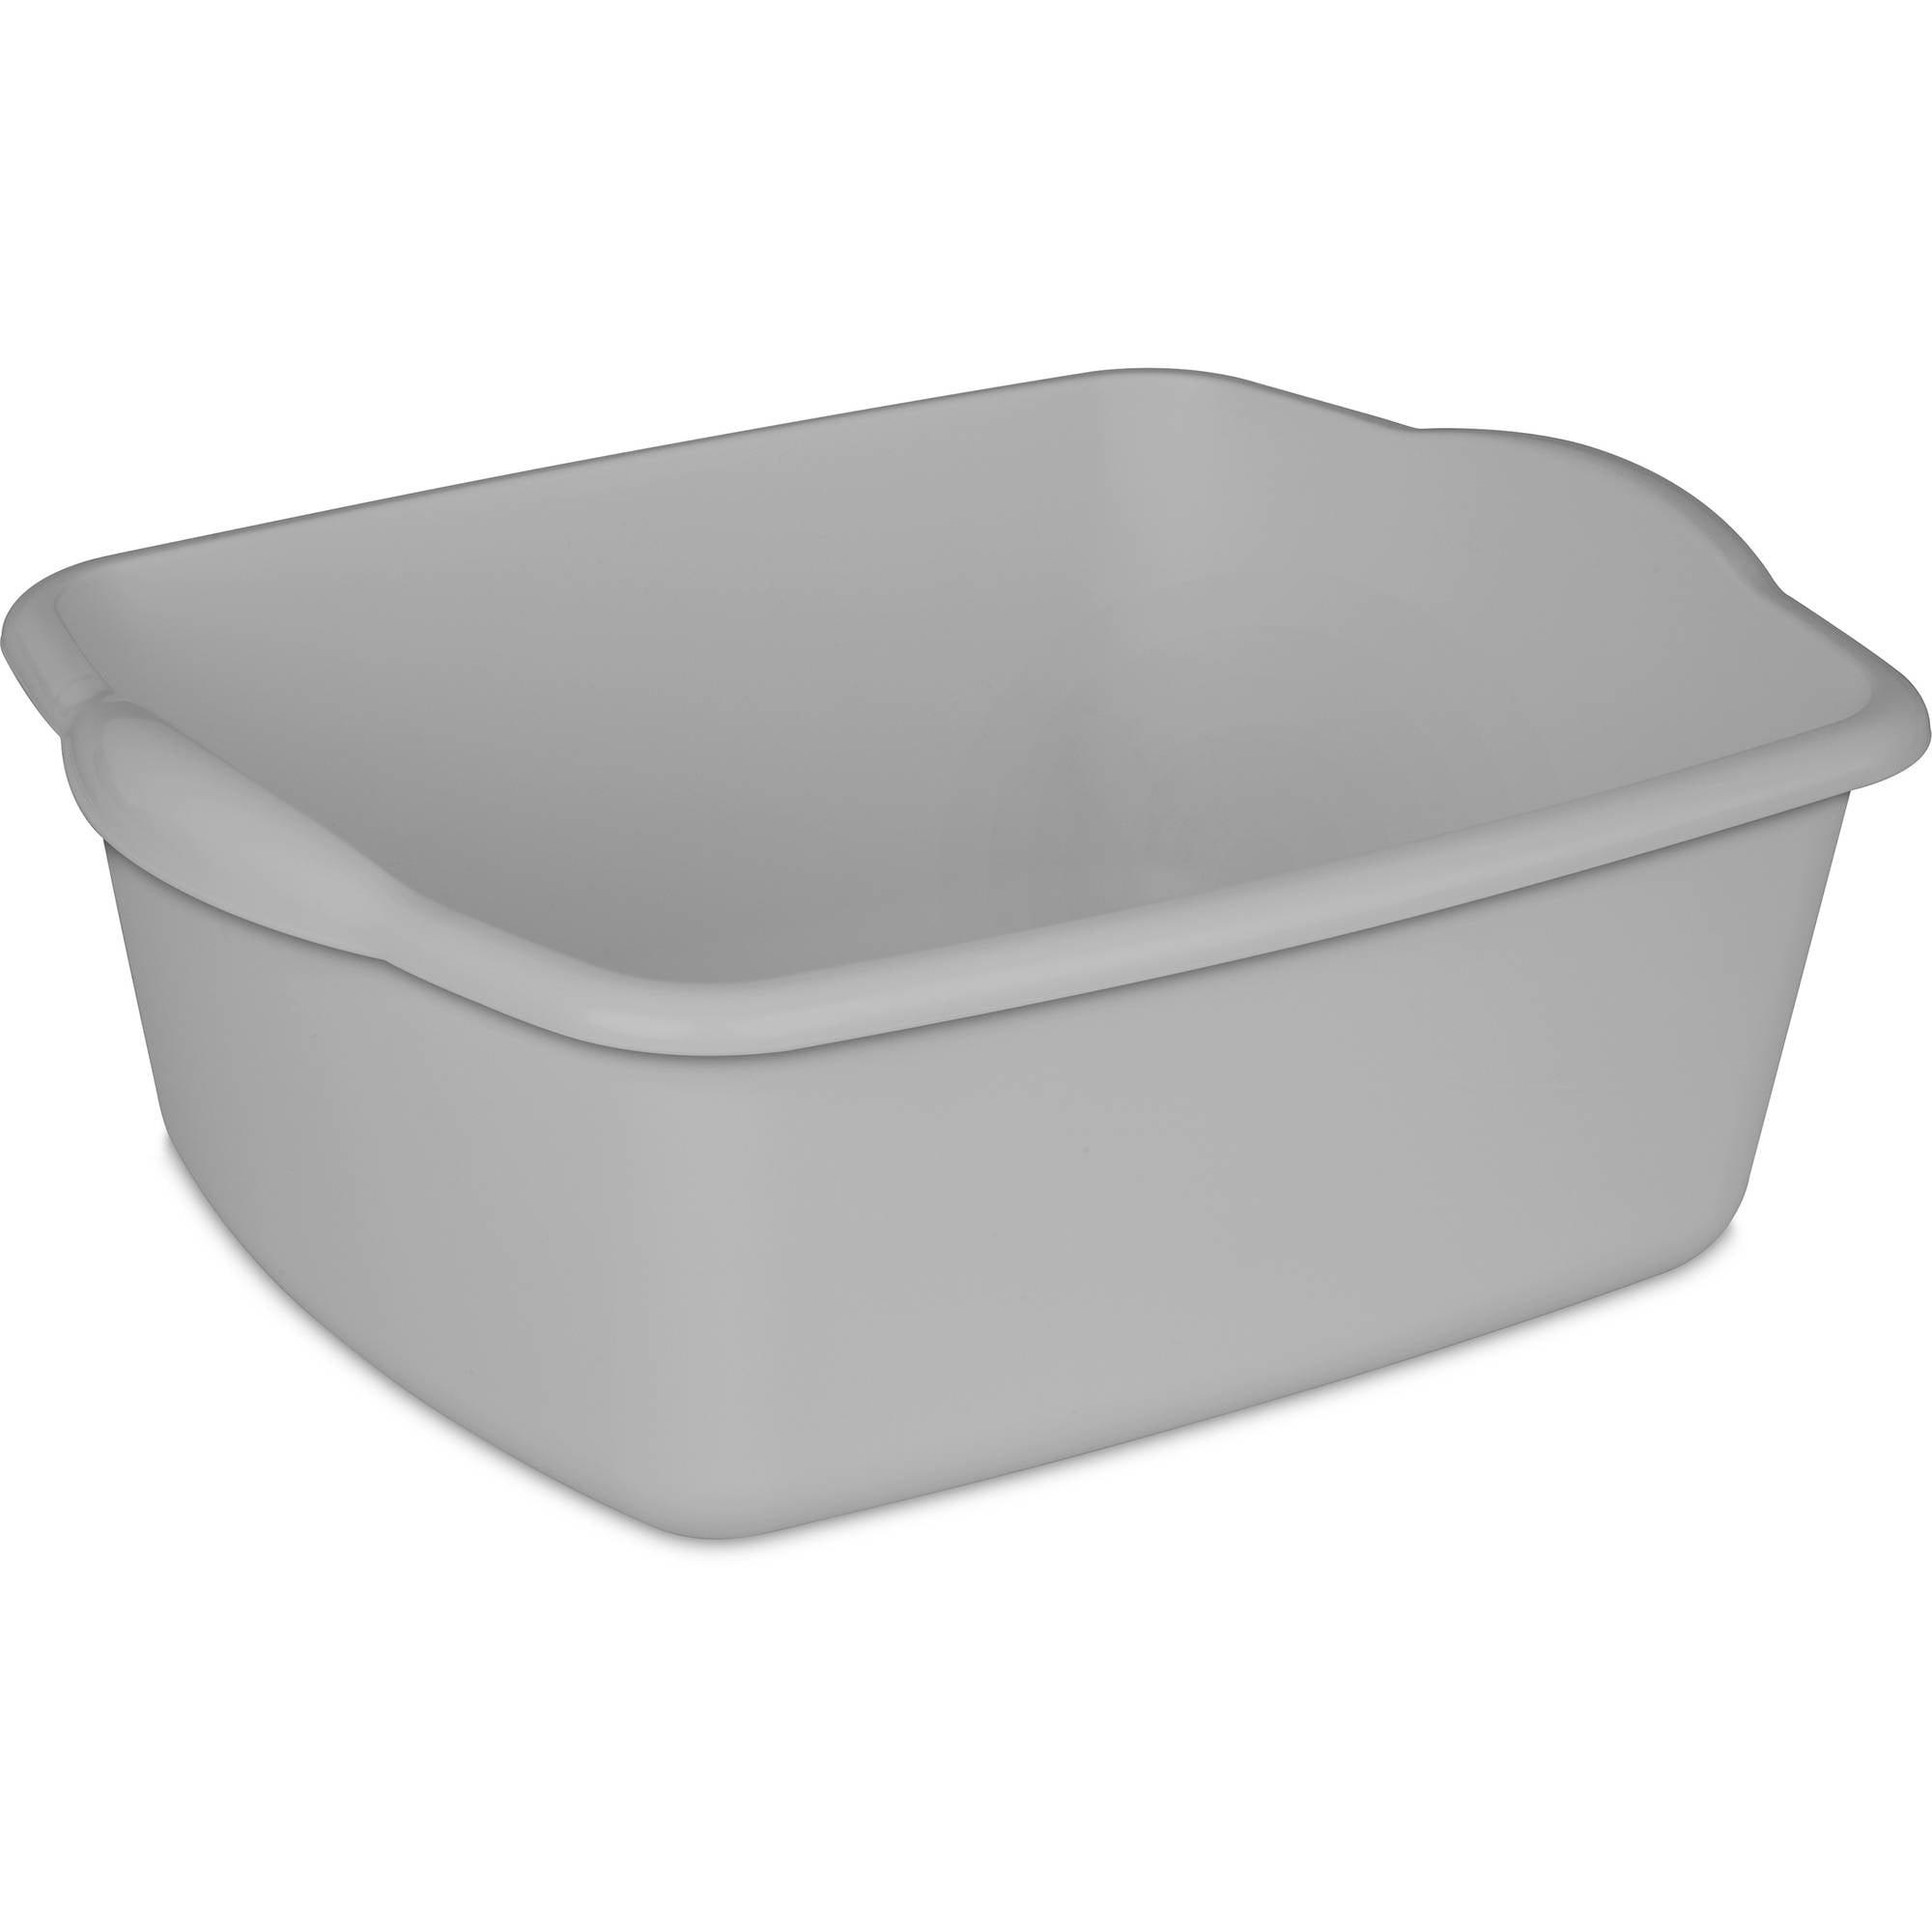 White Rubbermaid Antimicrobial Dish Bucket 15.6-Quart